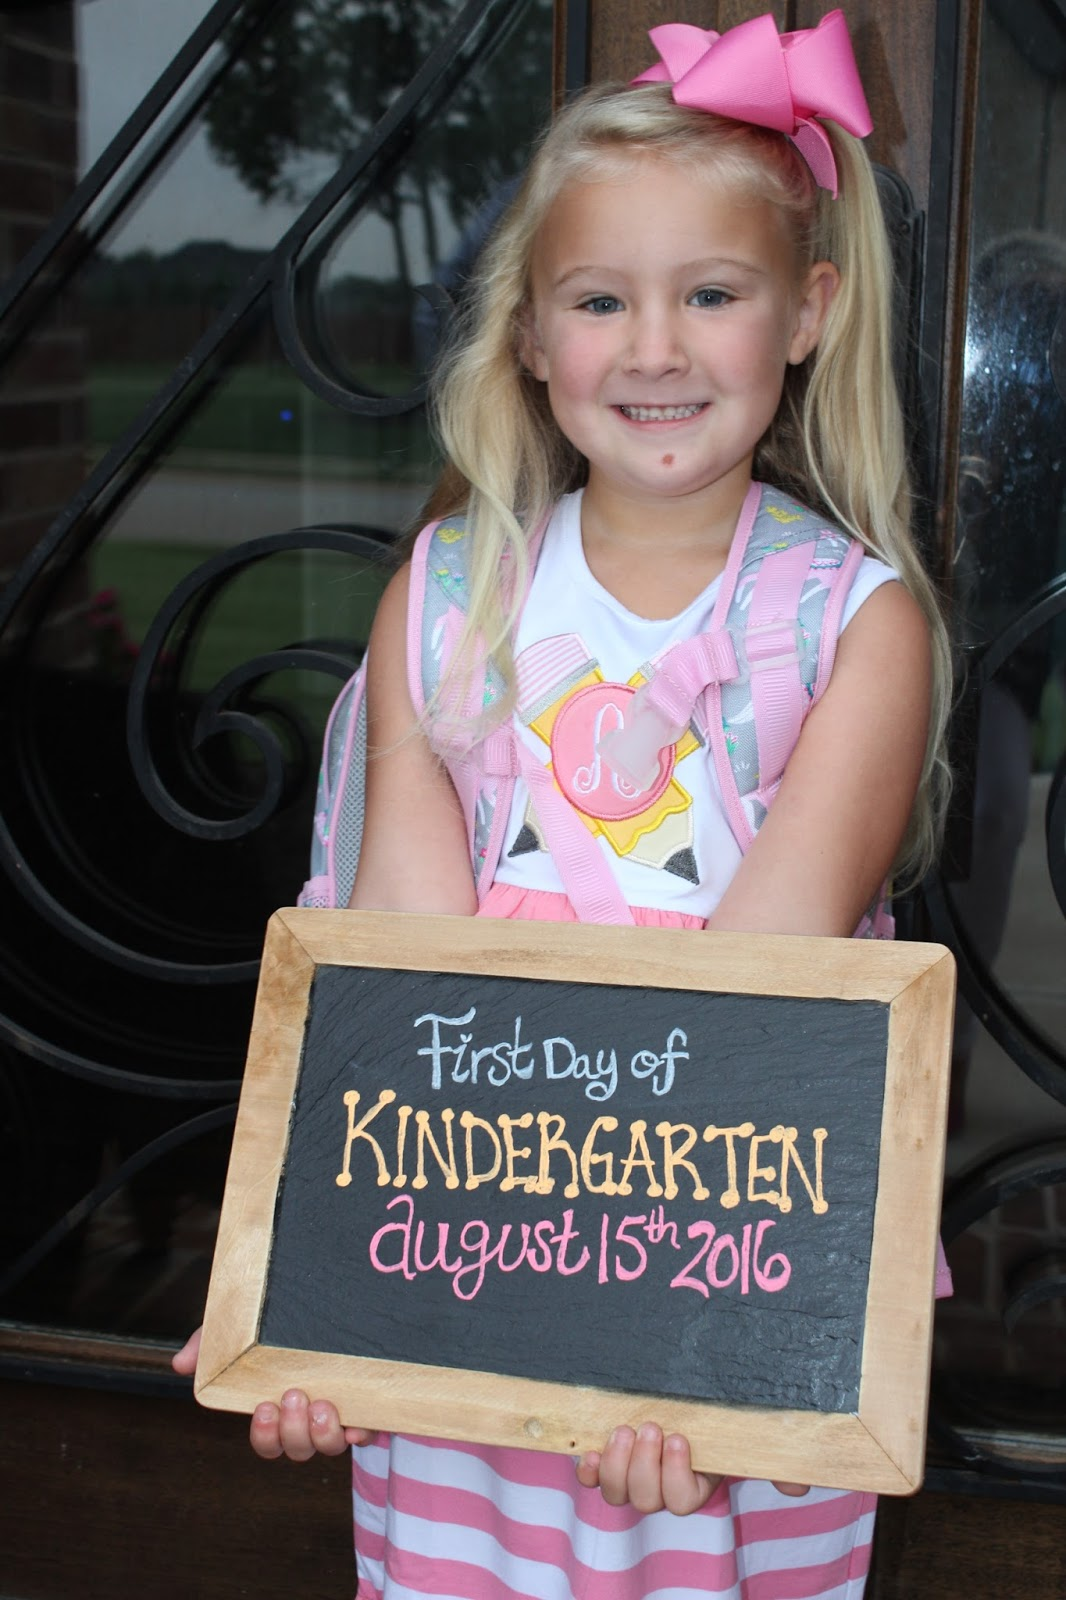 IMG 7790 - 1st Day Of Kindergarten